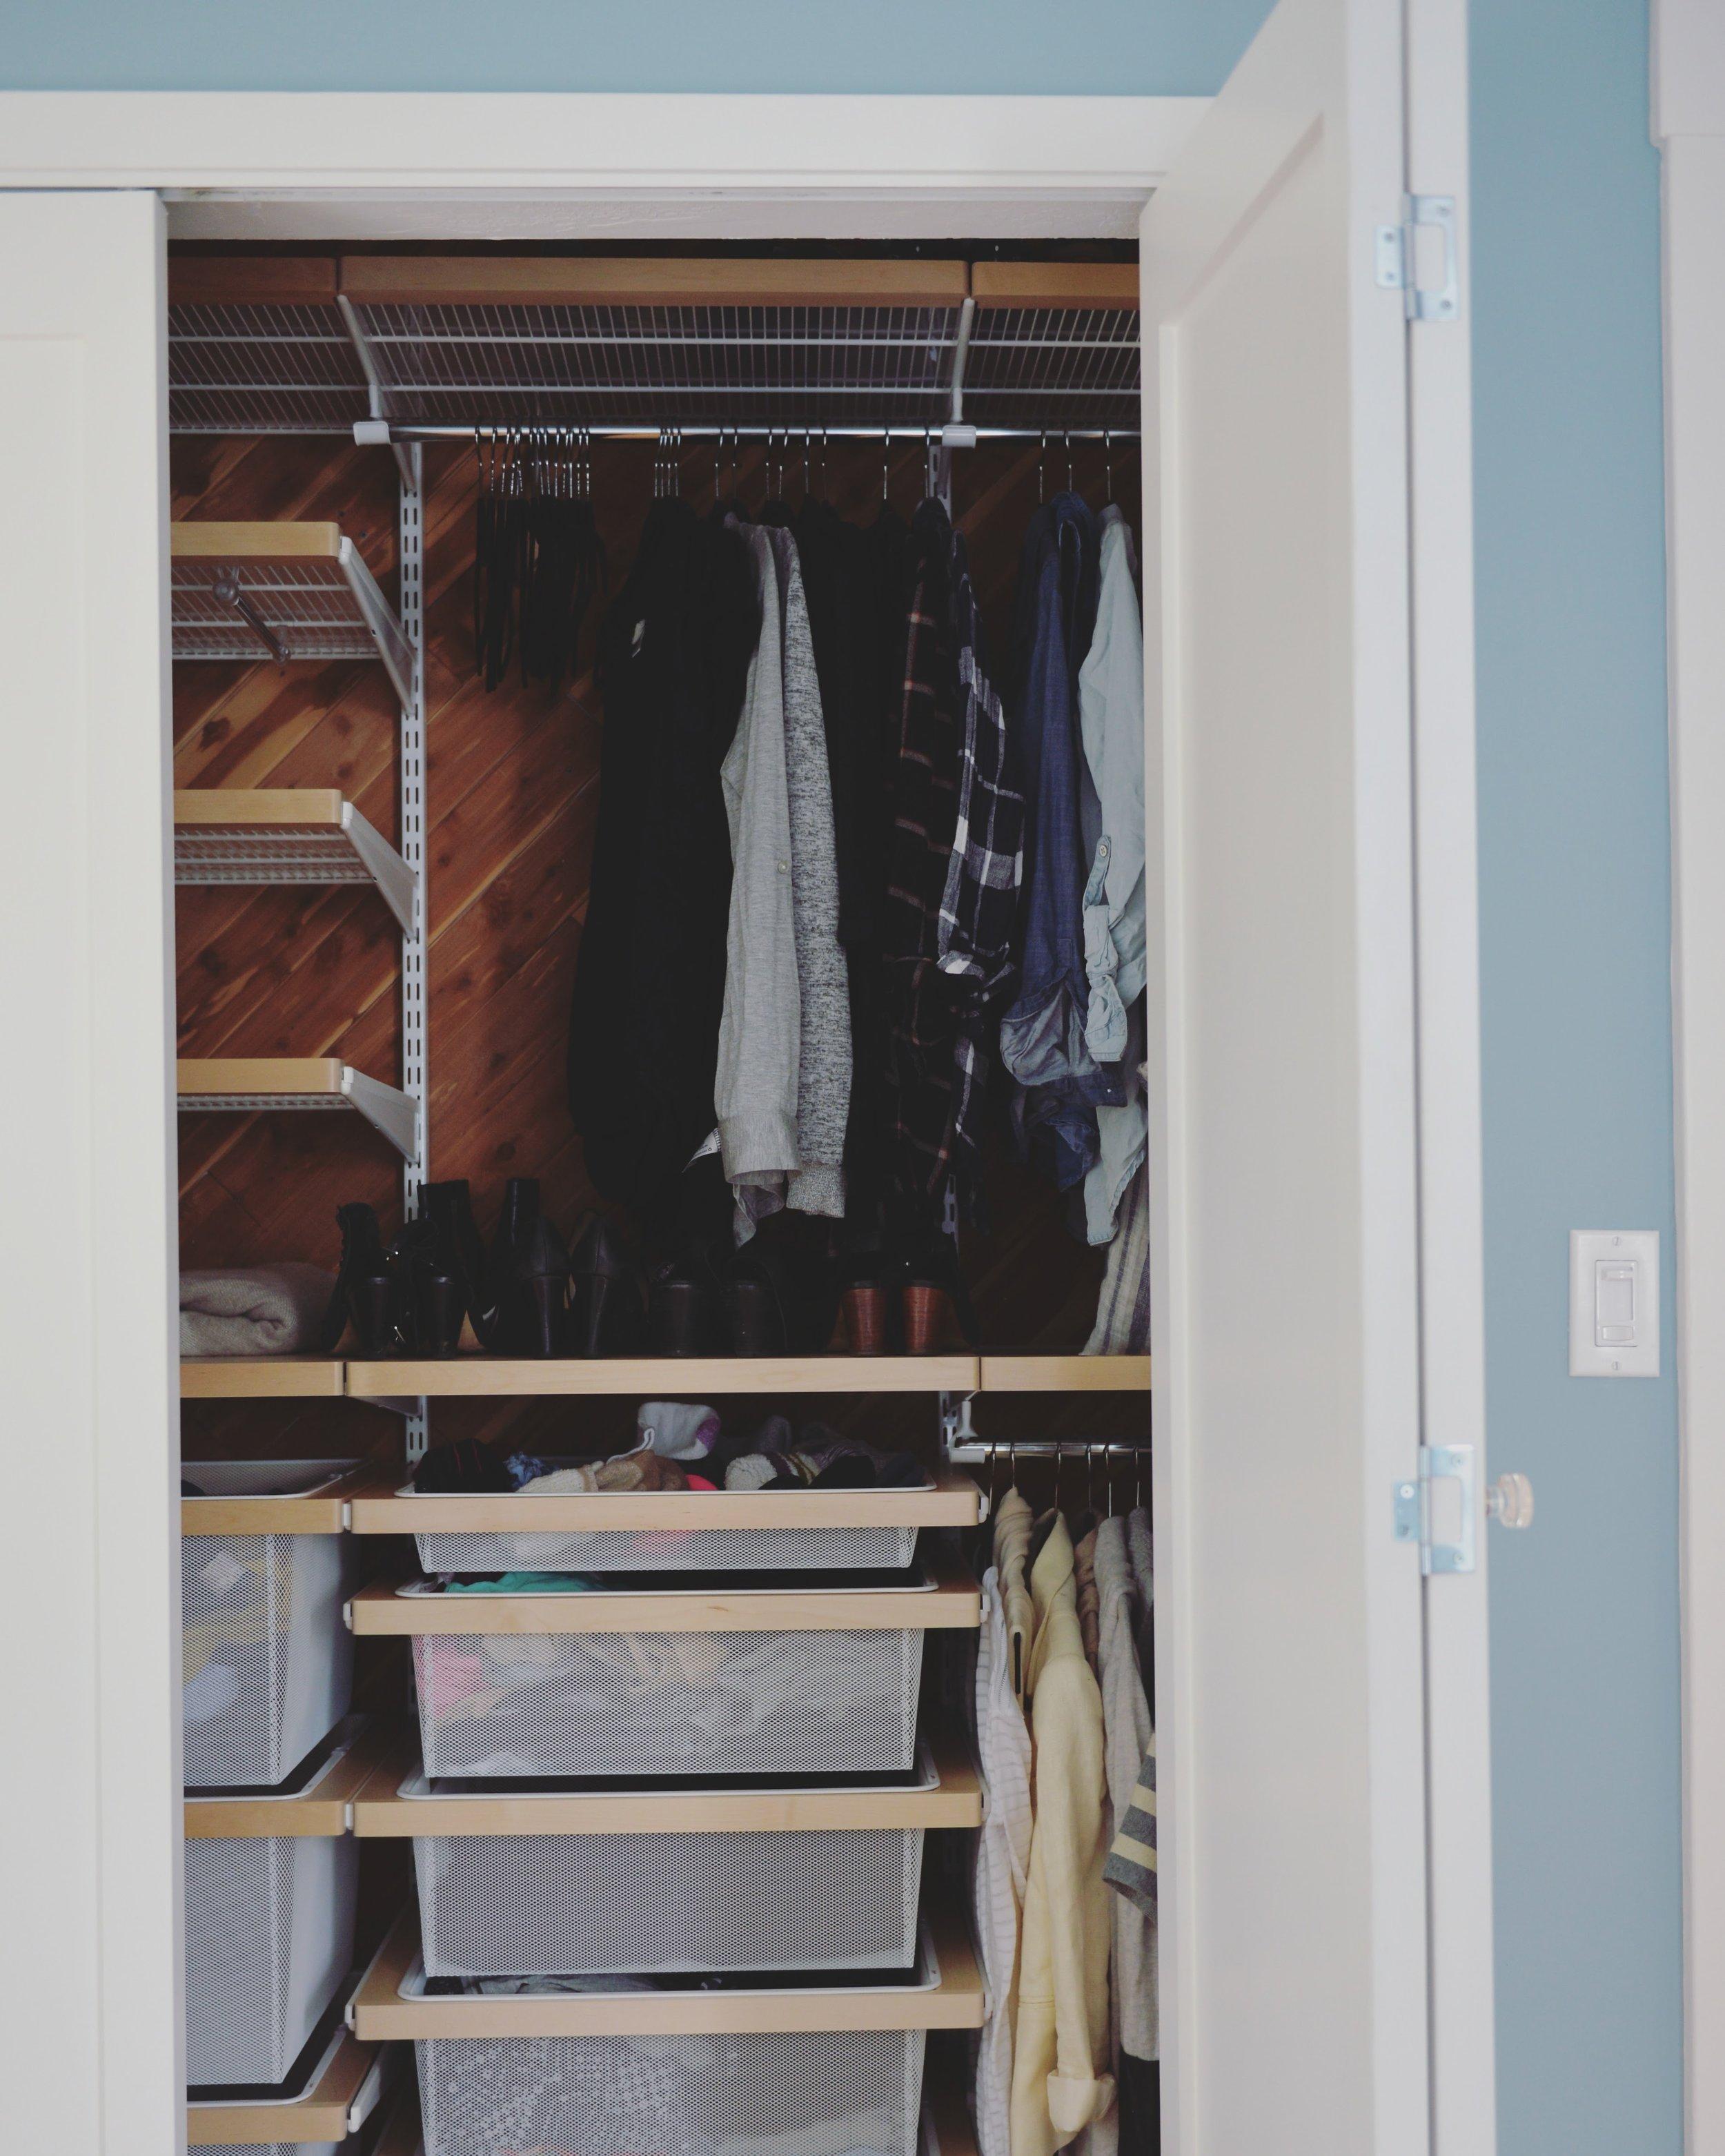 My half of the closet